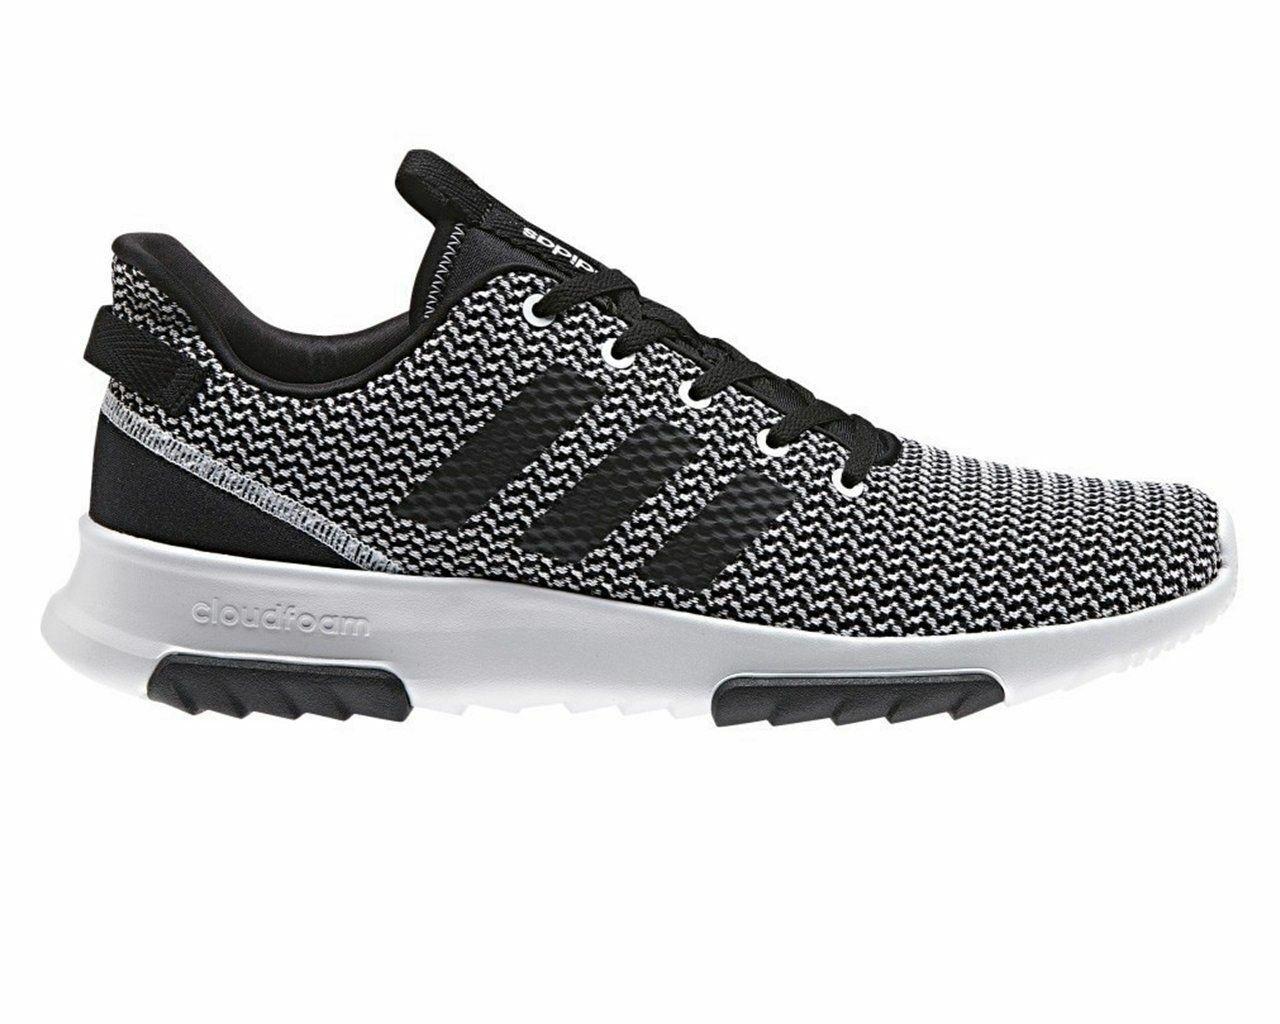 Para Hombre Adidas nube Espuma Racer TR DA9305 Gimnasio Correr Entrenadores Zapatos blancoo Negro